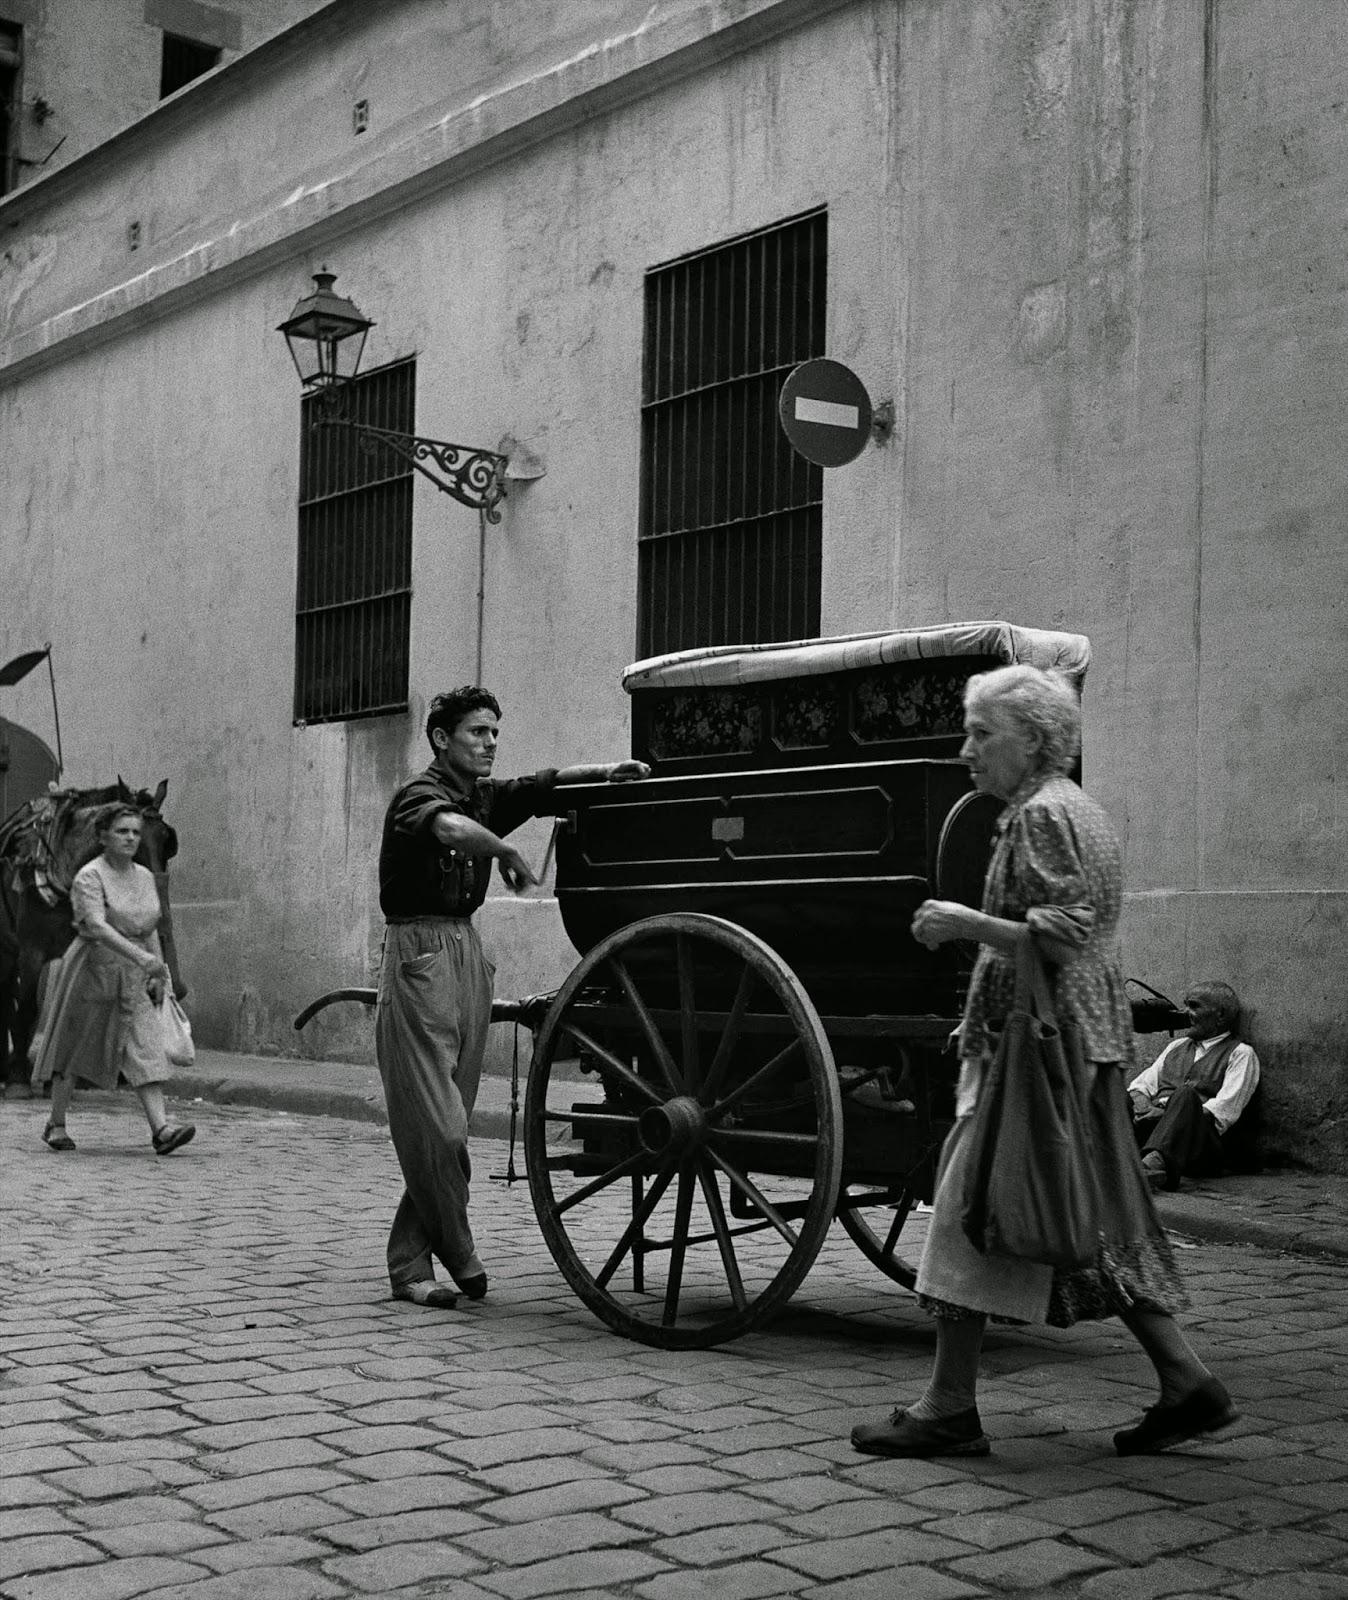 Amazing Black & White Photos Of Street Scenes Of Madrid